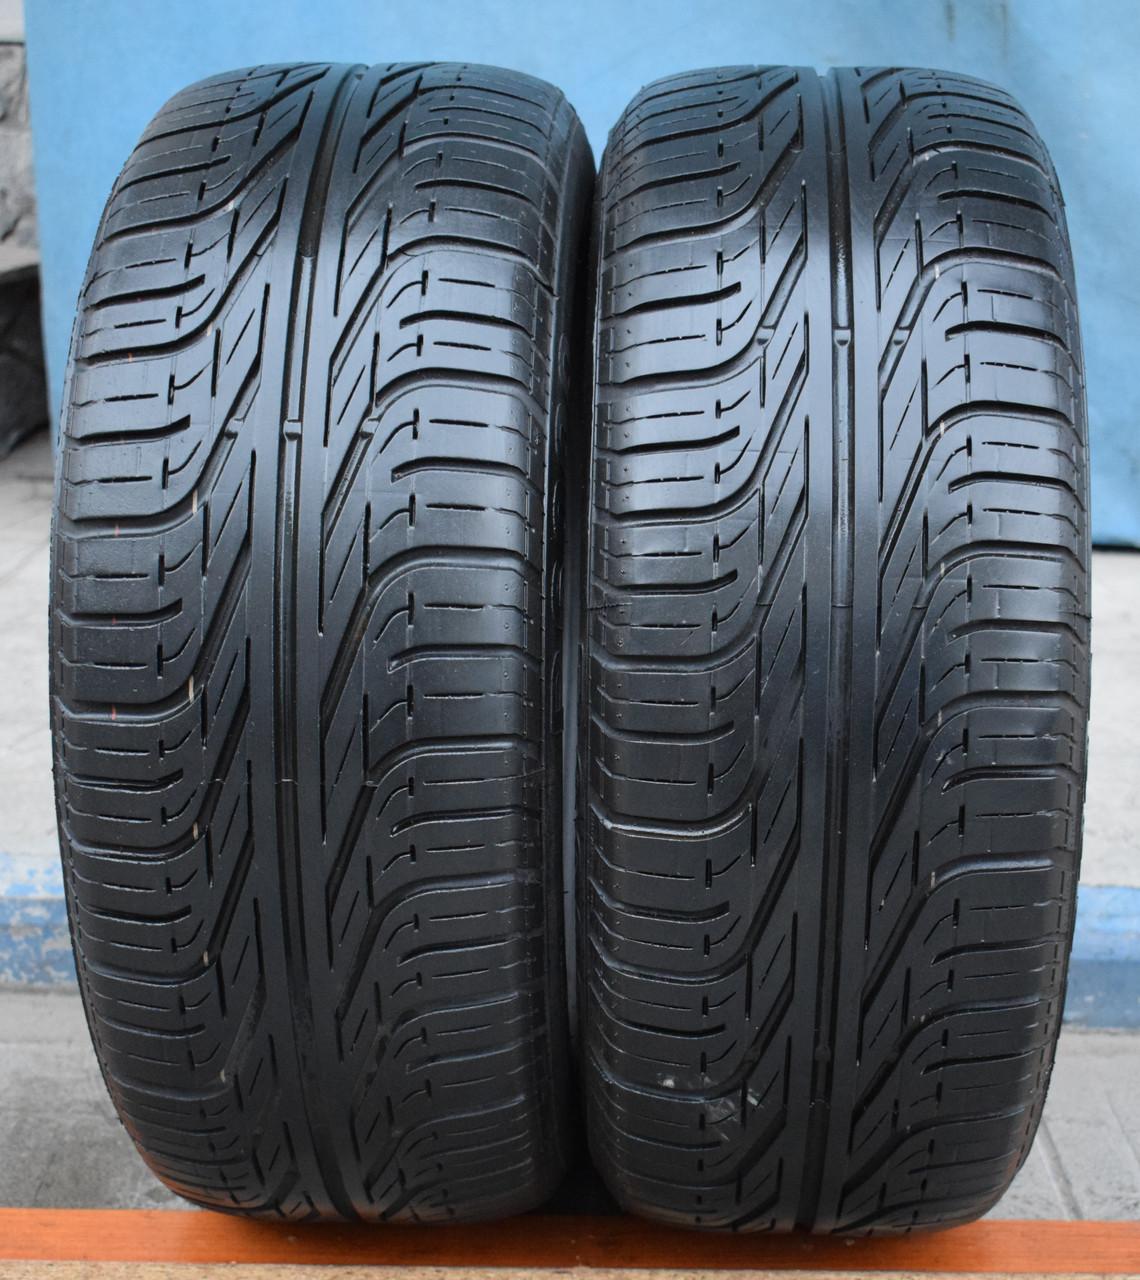 Шины б/у 215/60 R15 Pirelli P6000, ЛЕТО, пара, 5,5-6 мм